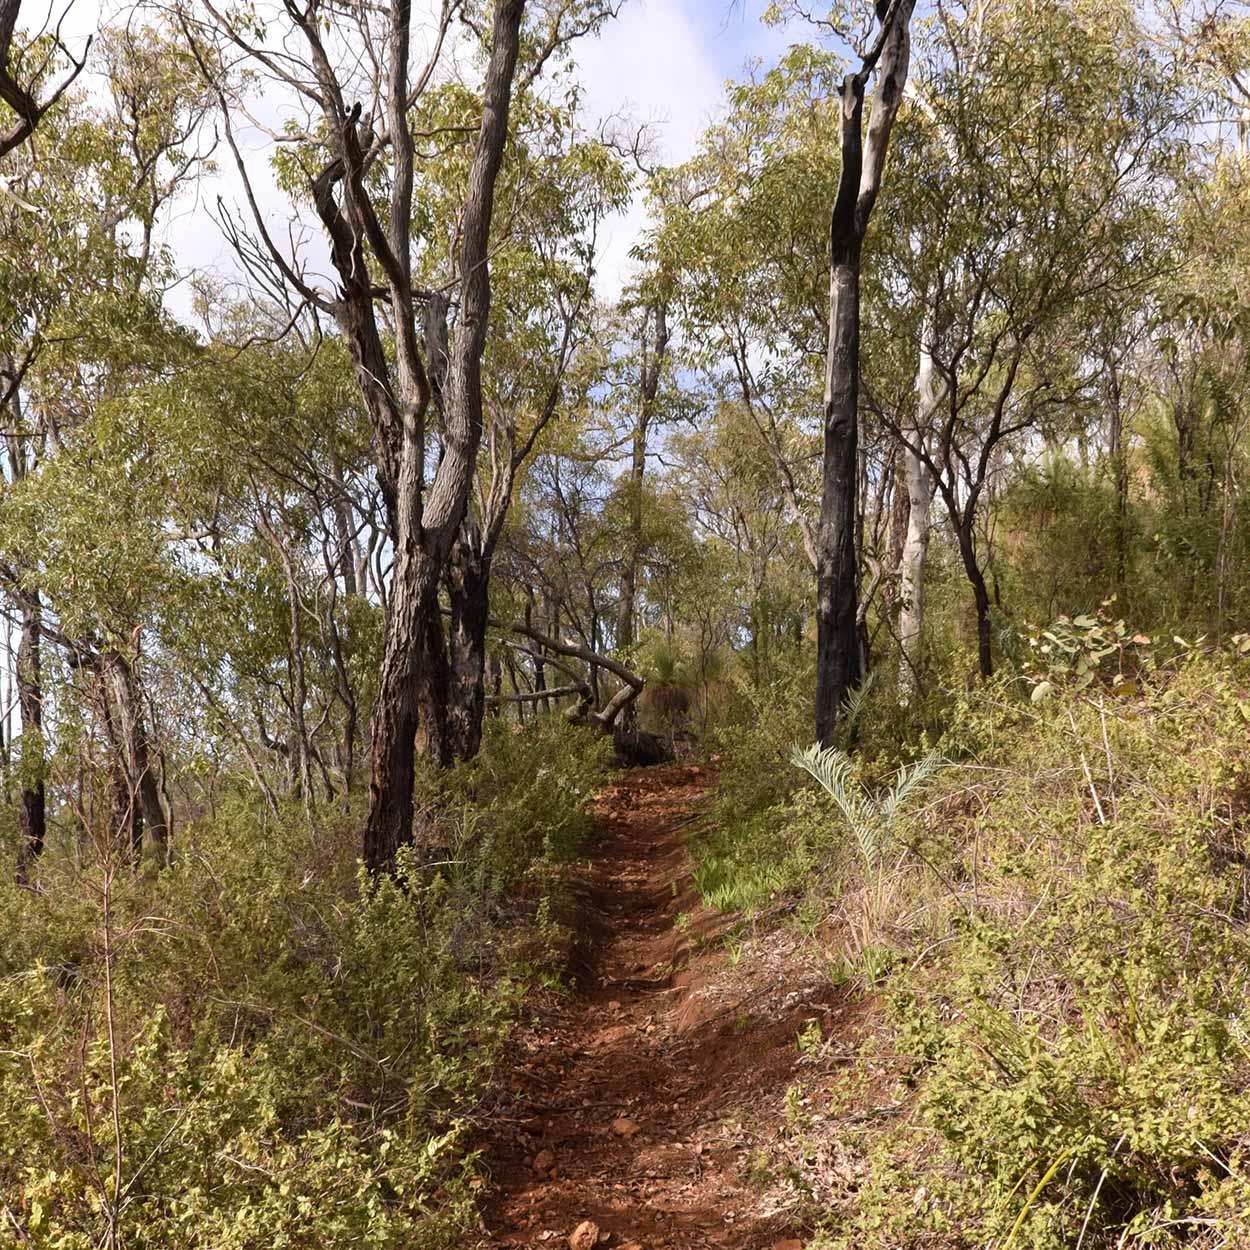 Hiking the Echidna Trail, Wungong Regional Park, Perth, Western Australia